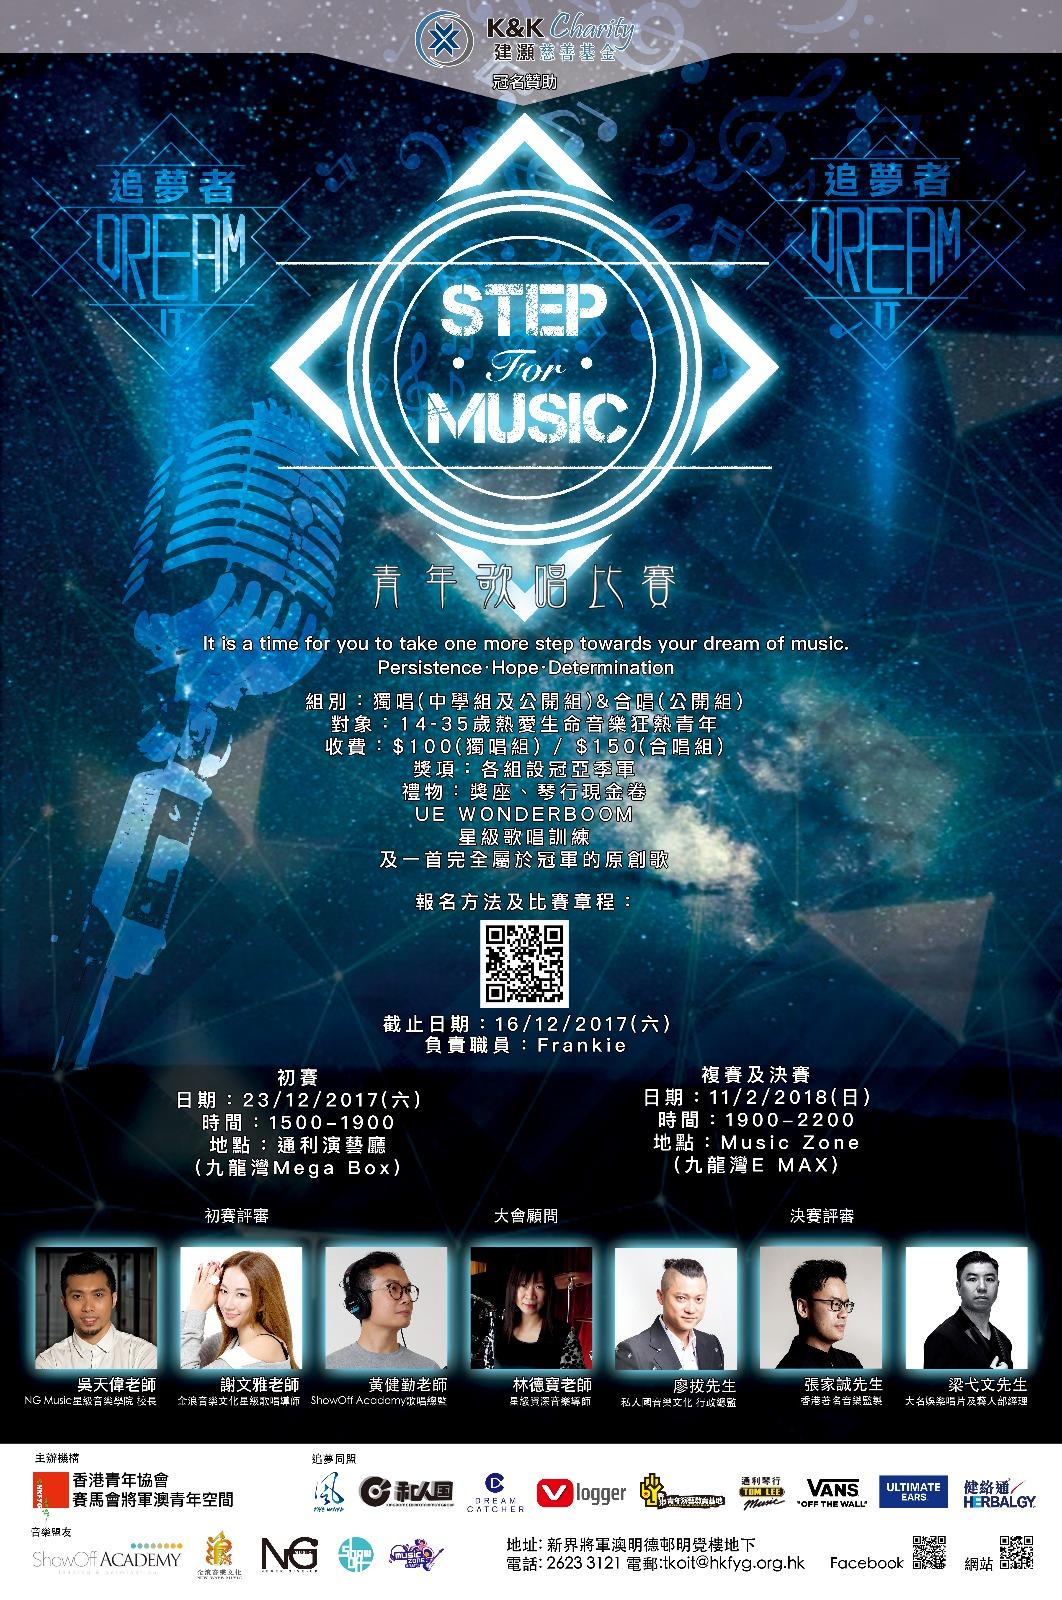 STEP FOR MUSIC 青年歌唱比賽 (1216截止) - 星格流行音樂學院 Starry World Music Academy|學唱歌|唱歌班|歌唱導師 ...